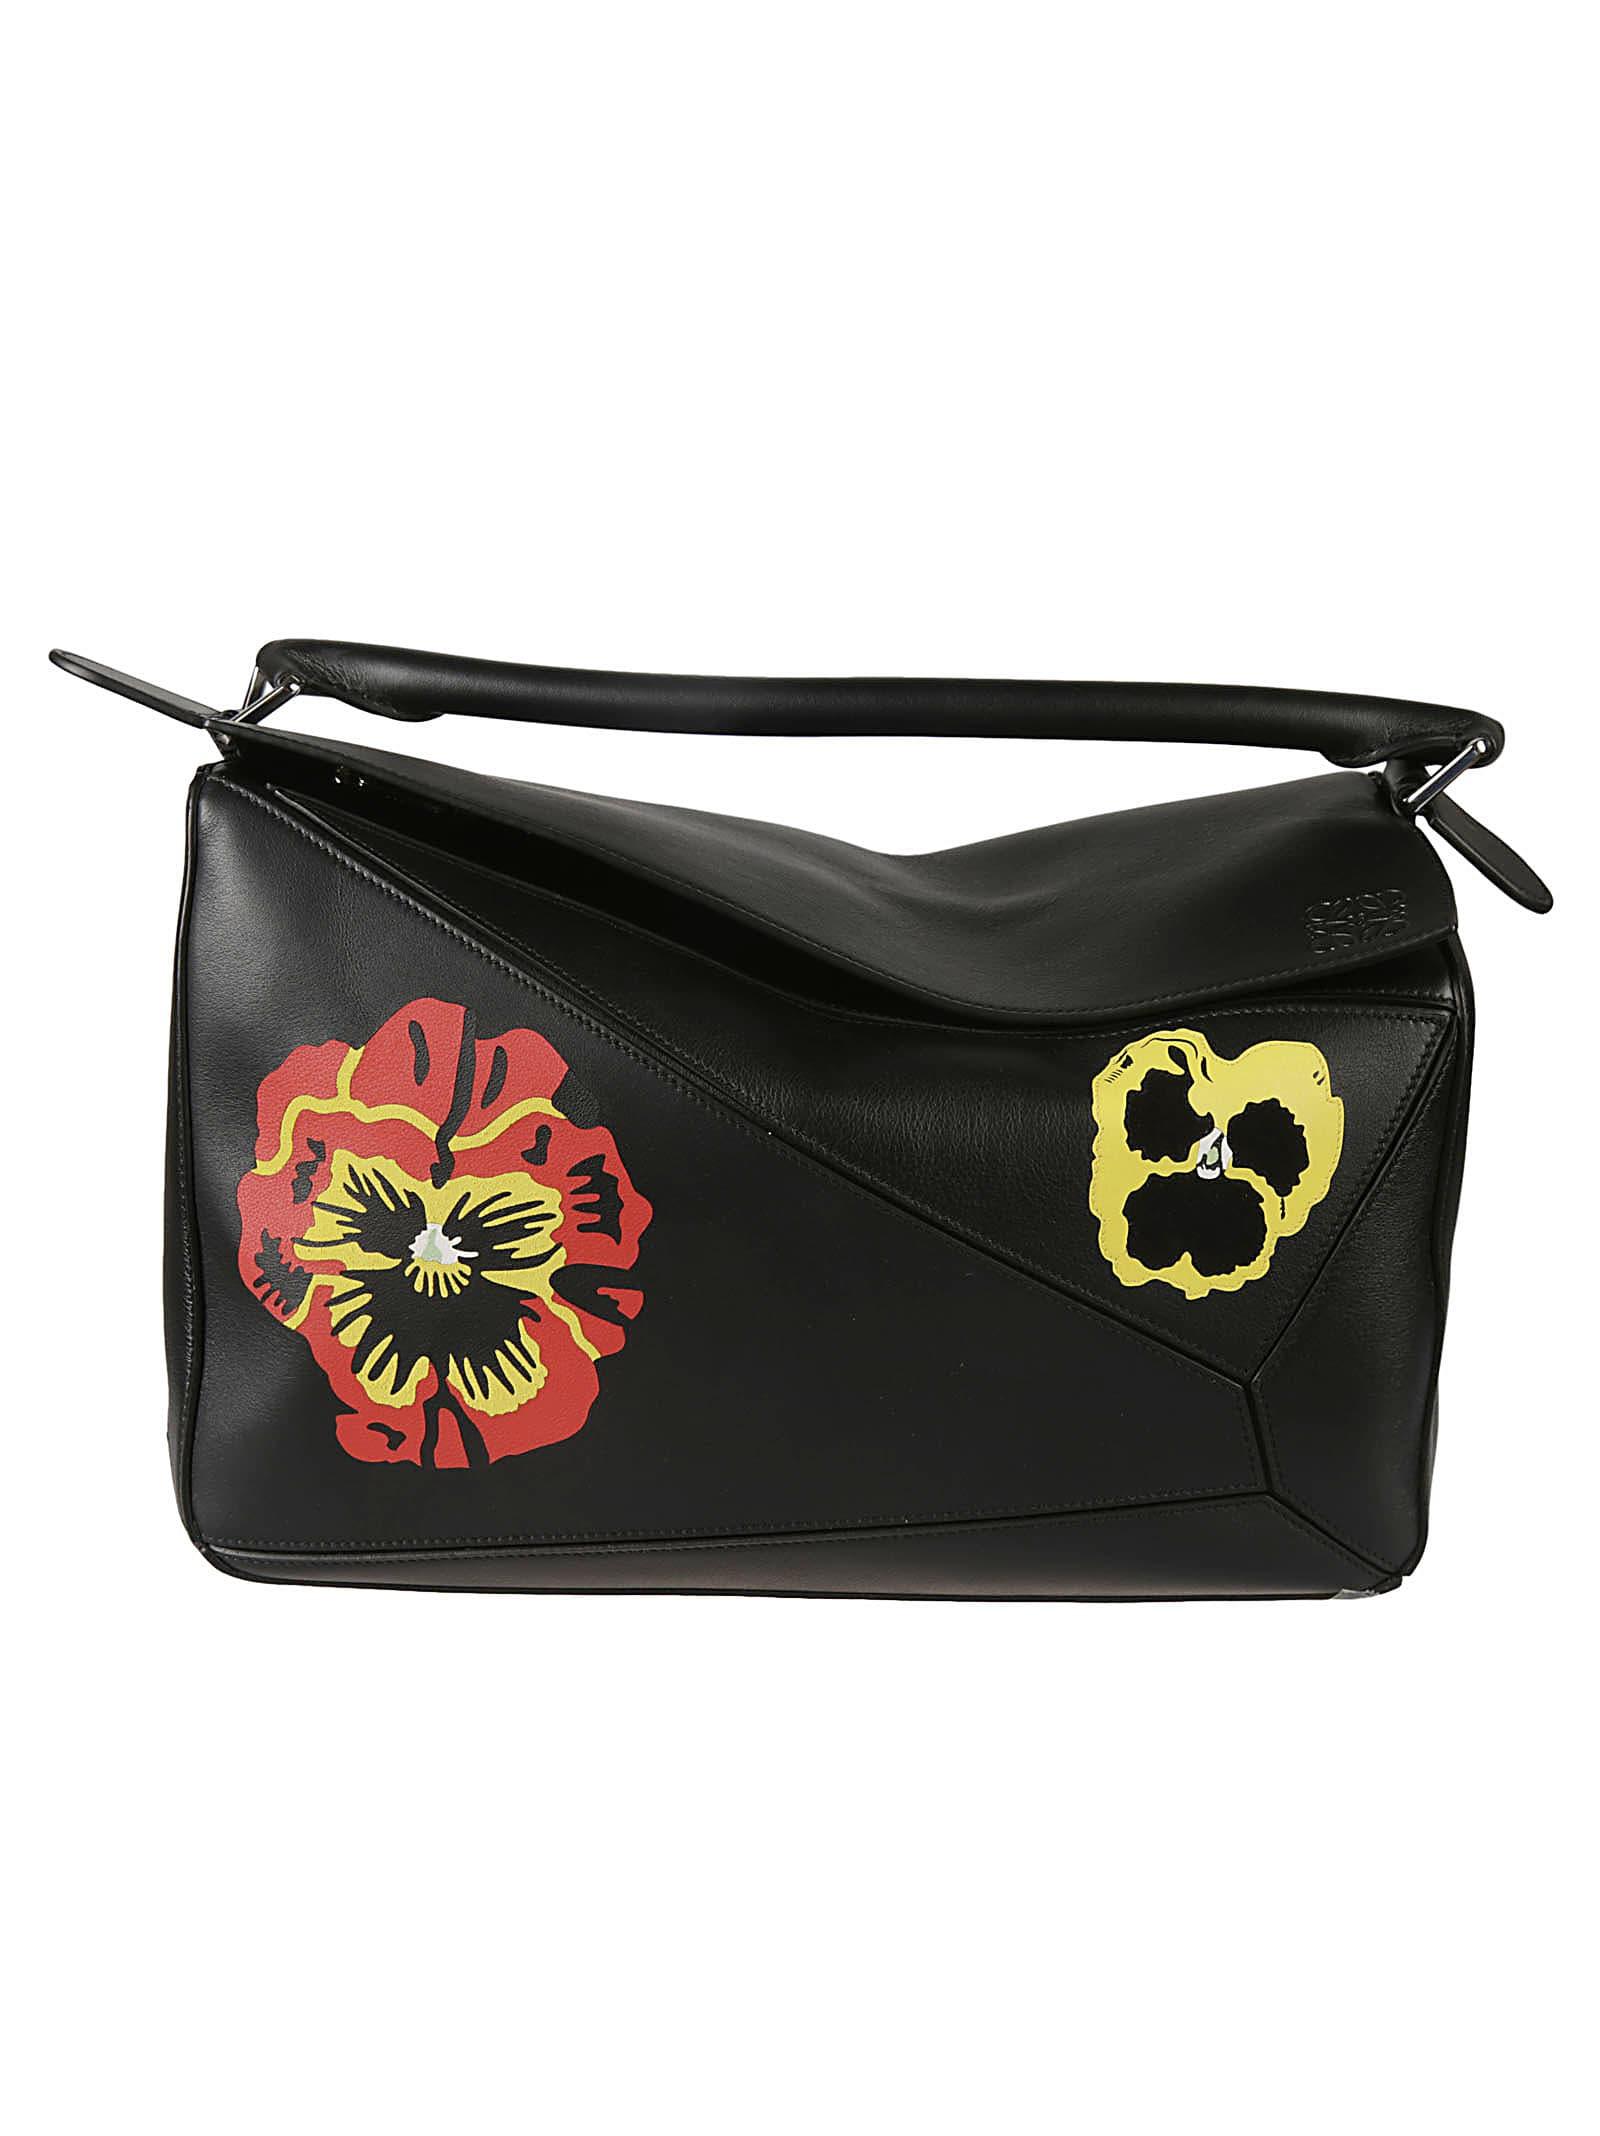 Loewe Puzzle Pans Shoulder Bag